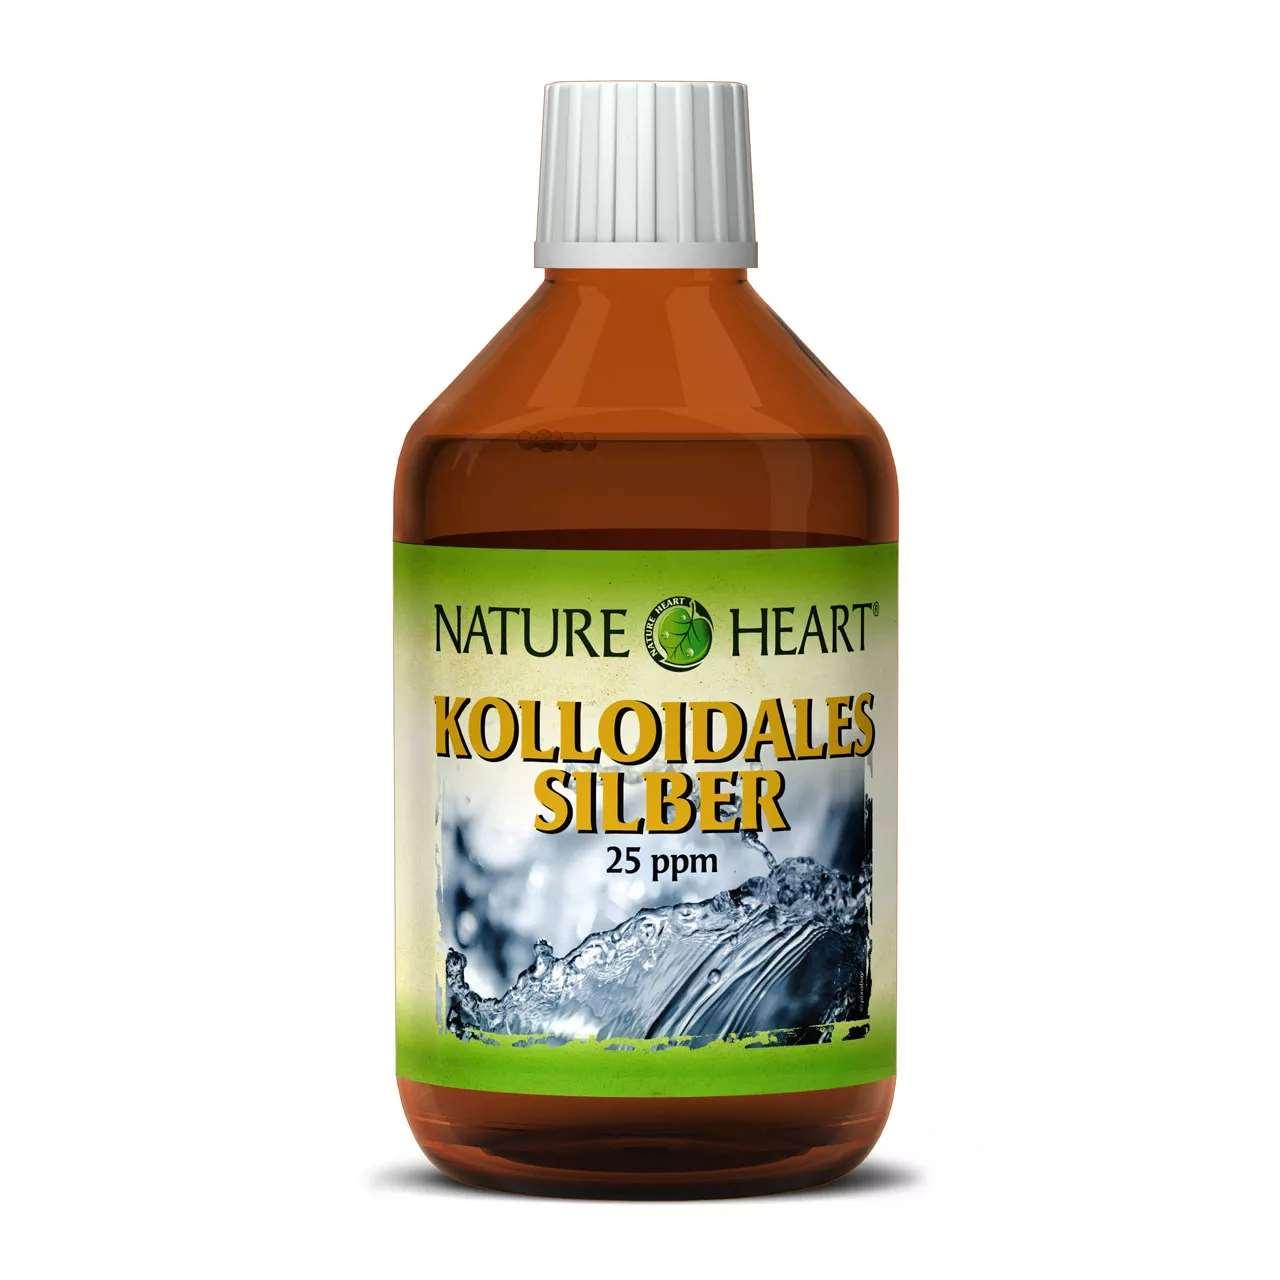 Kolloidales Silber 25 ppm, 250 ml